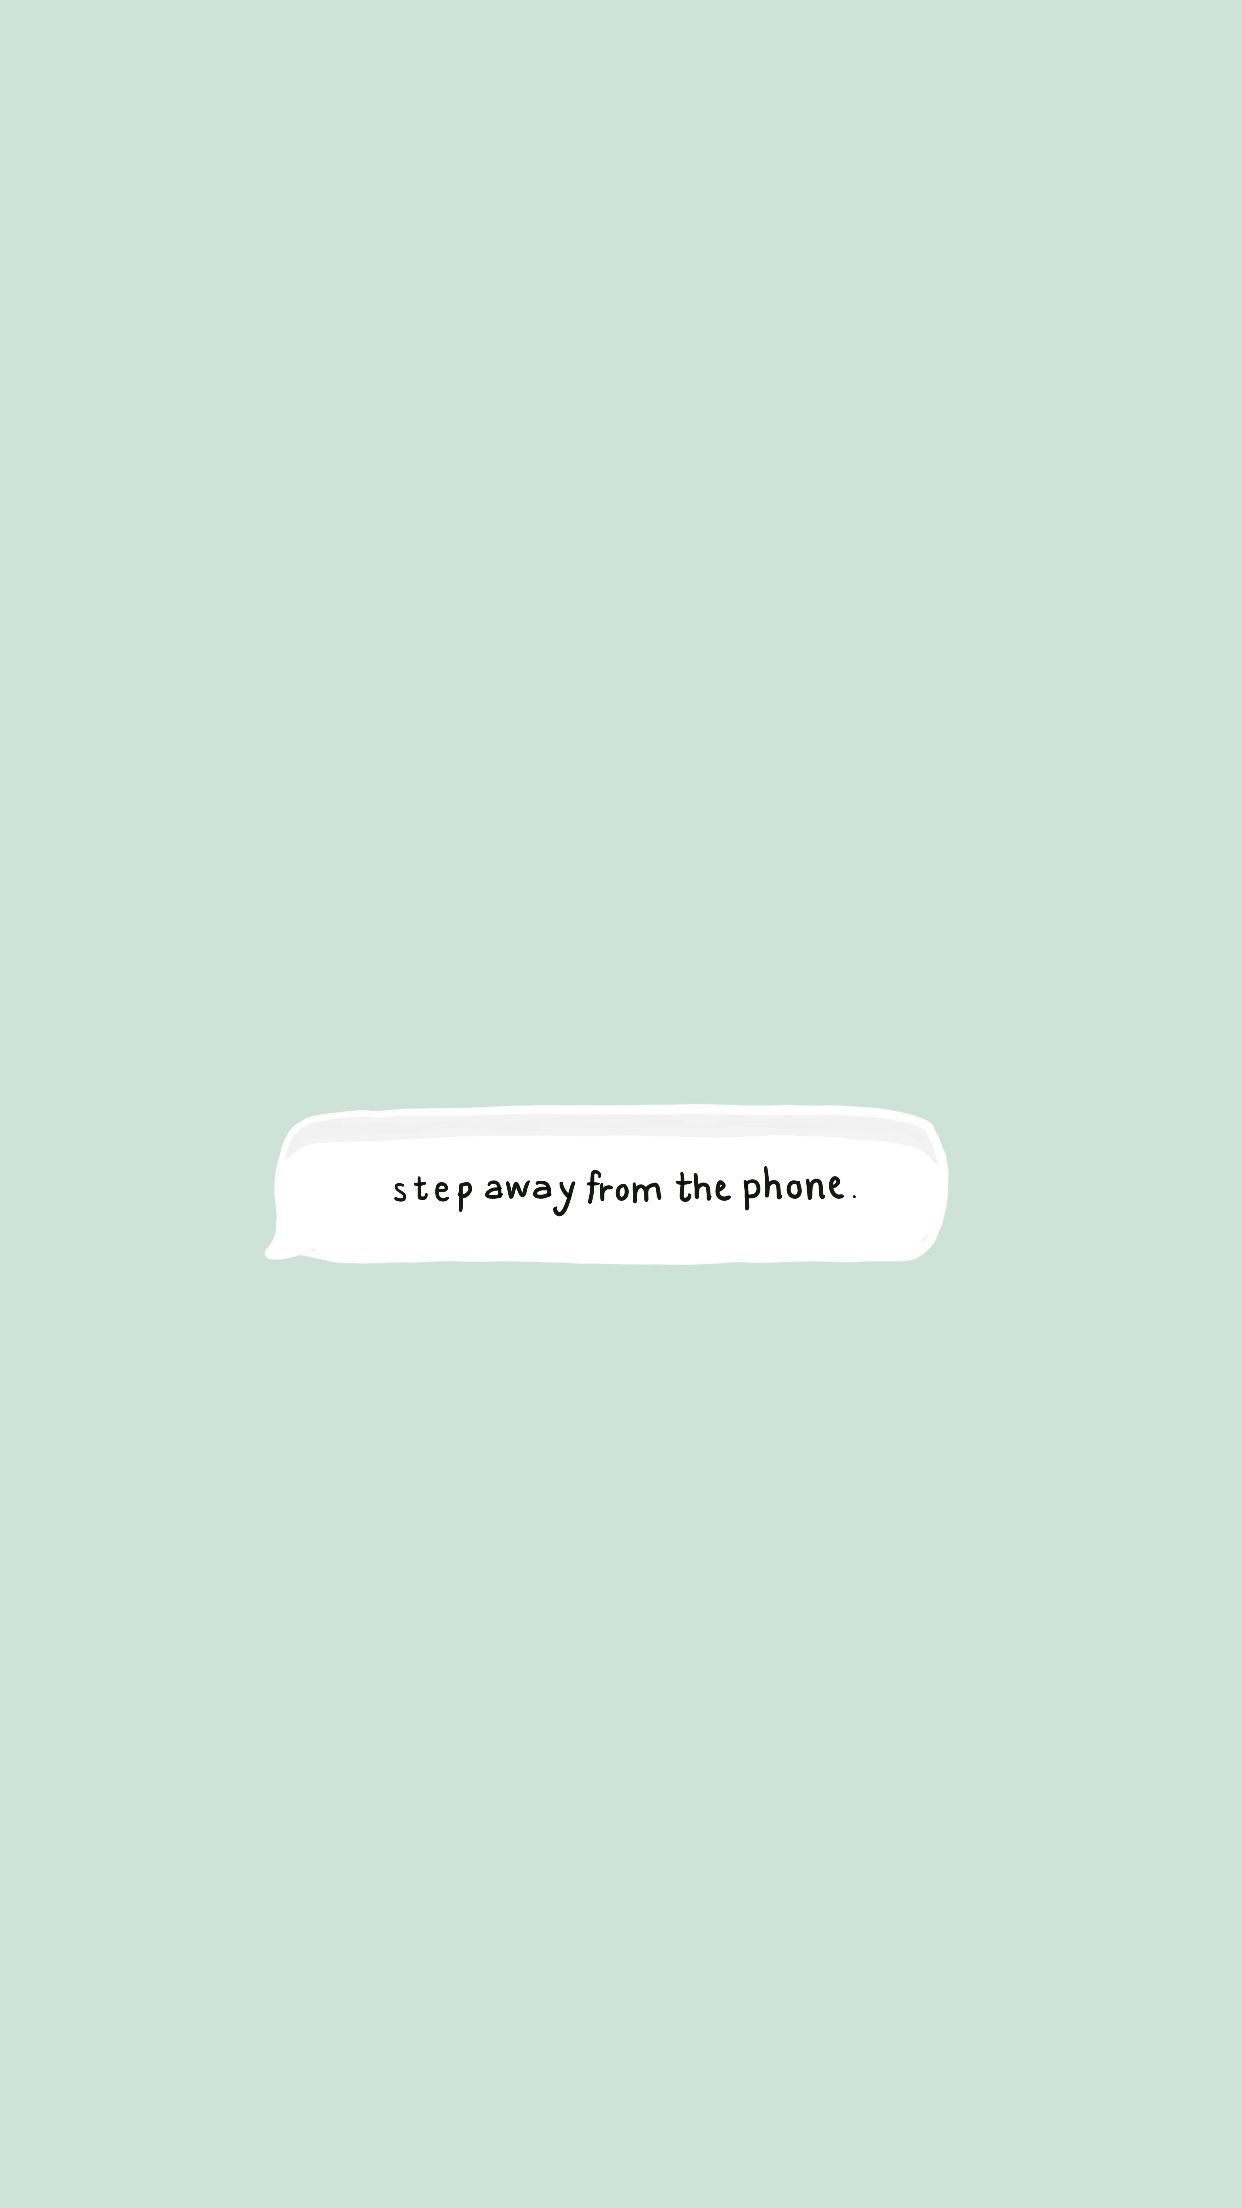 Iphone Lock Screen Funny Phone Wallpaper Words Wallpaper Dont Touch My Phone Wallpapers